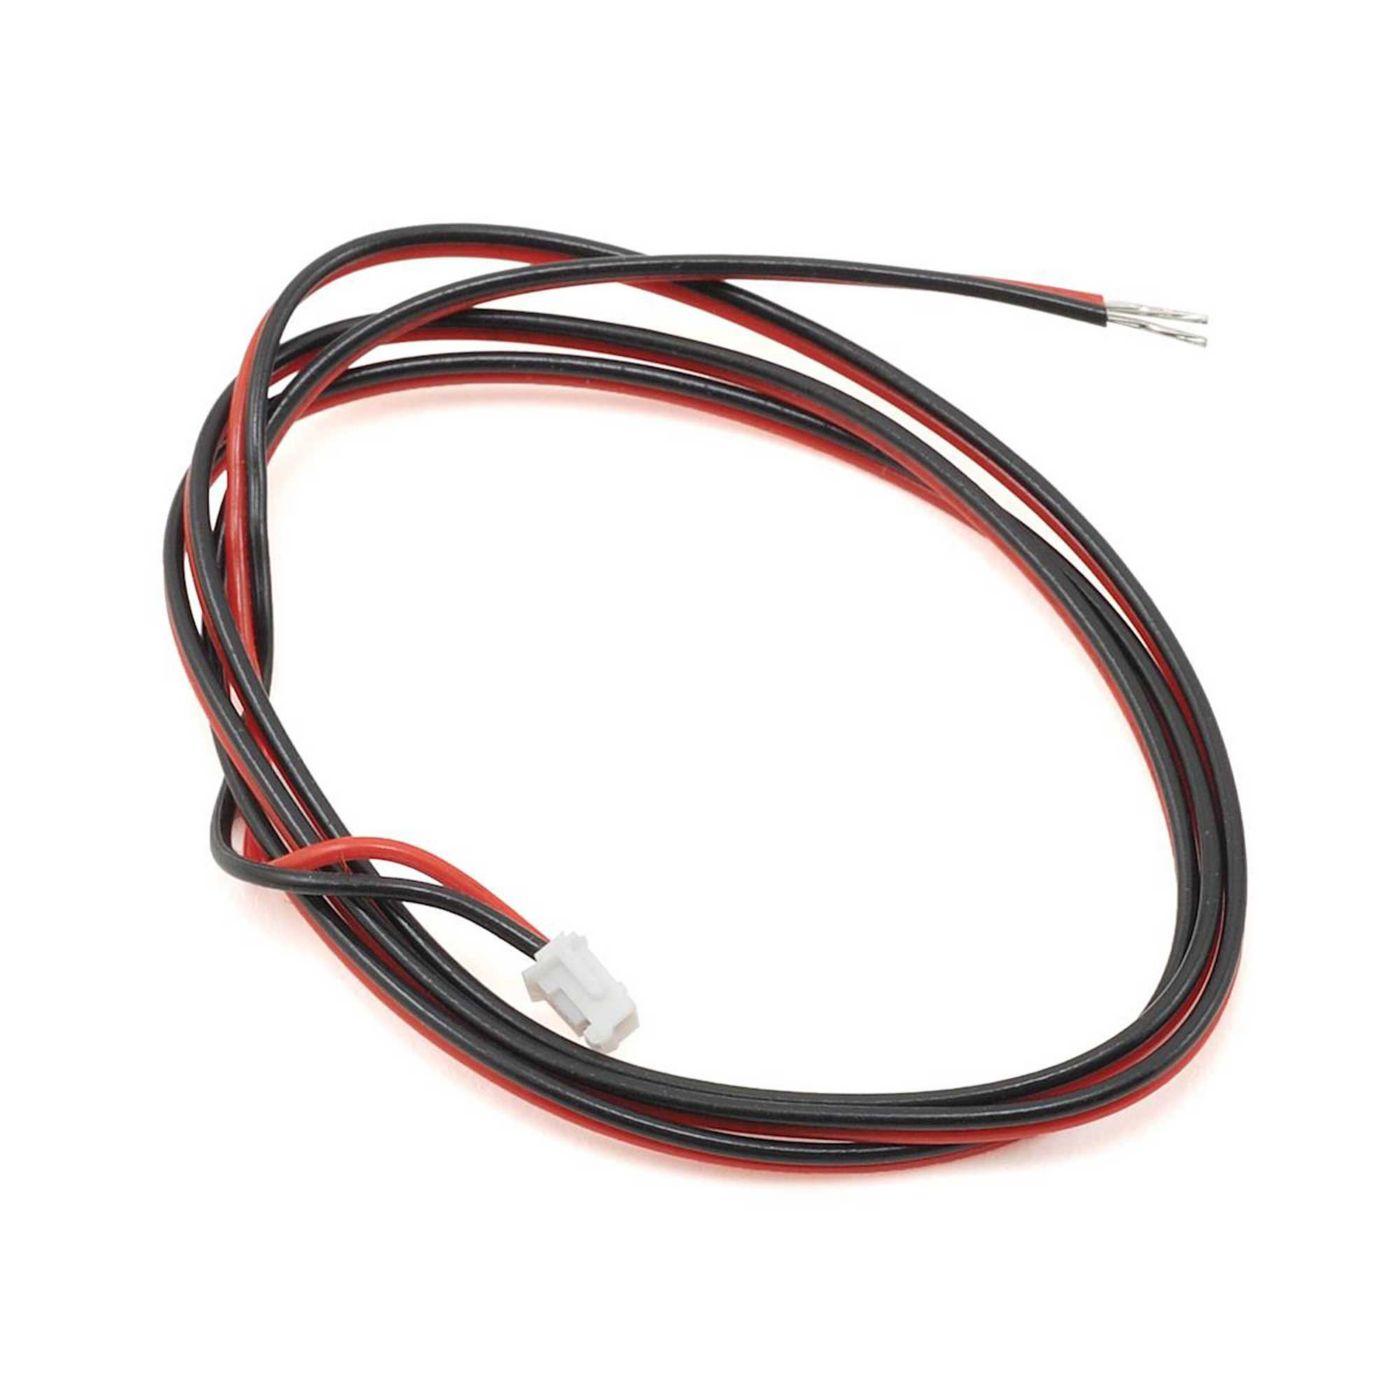 Spektrum SPMA9570A Aircraft Telemetry Flight Pack Voltage Sensor-2pin DX6R